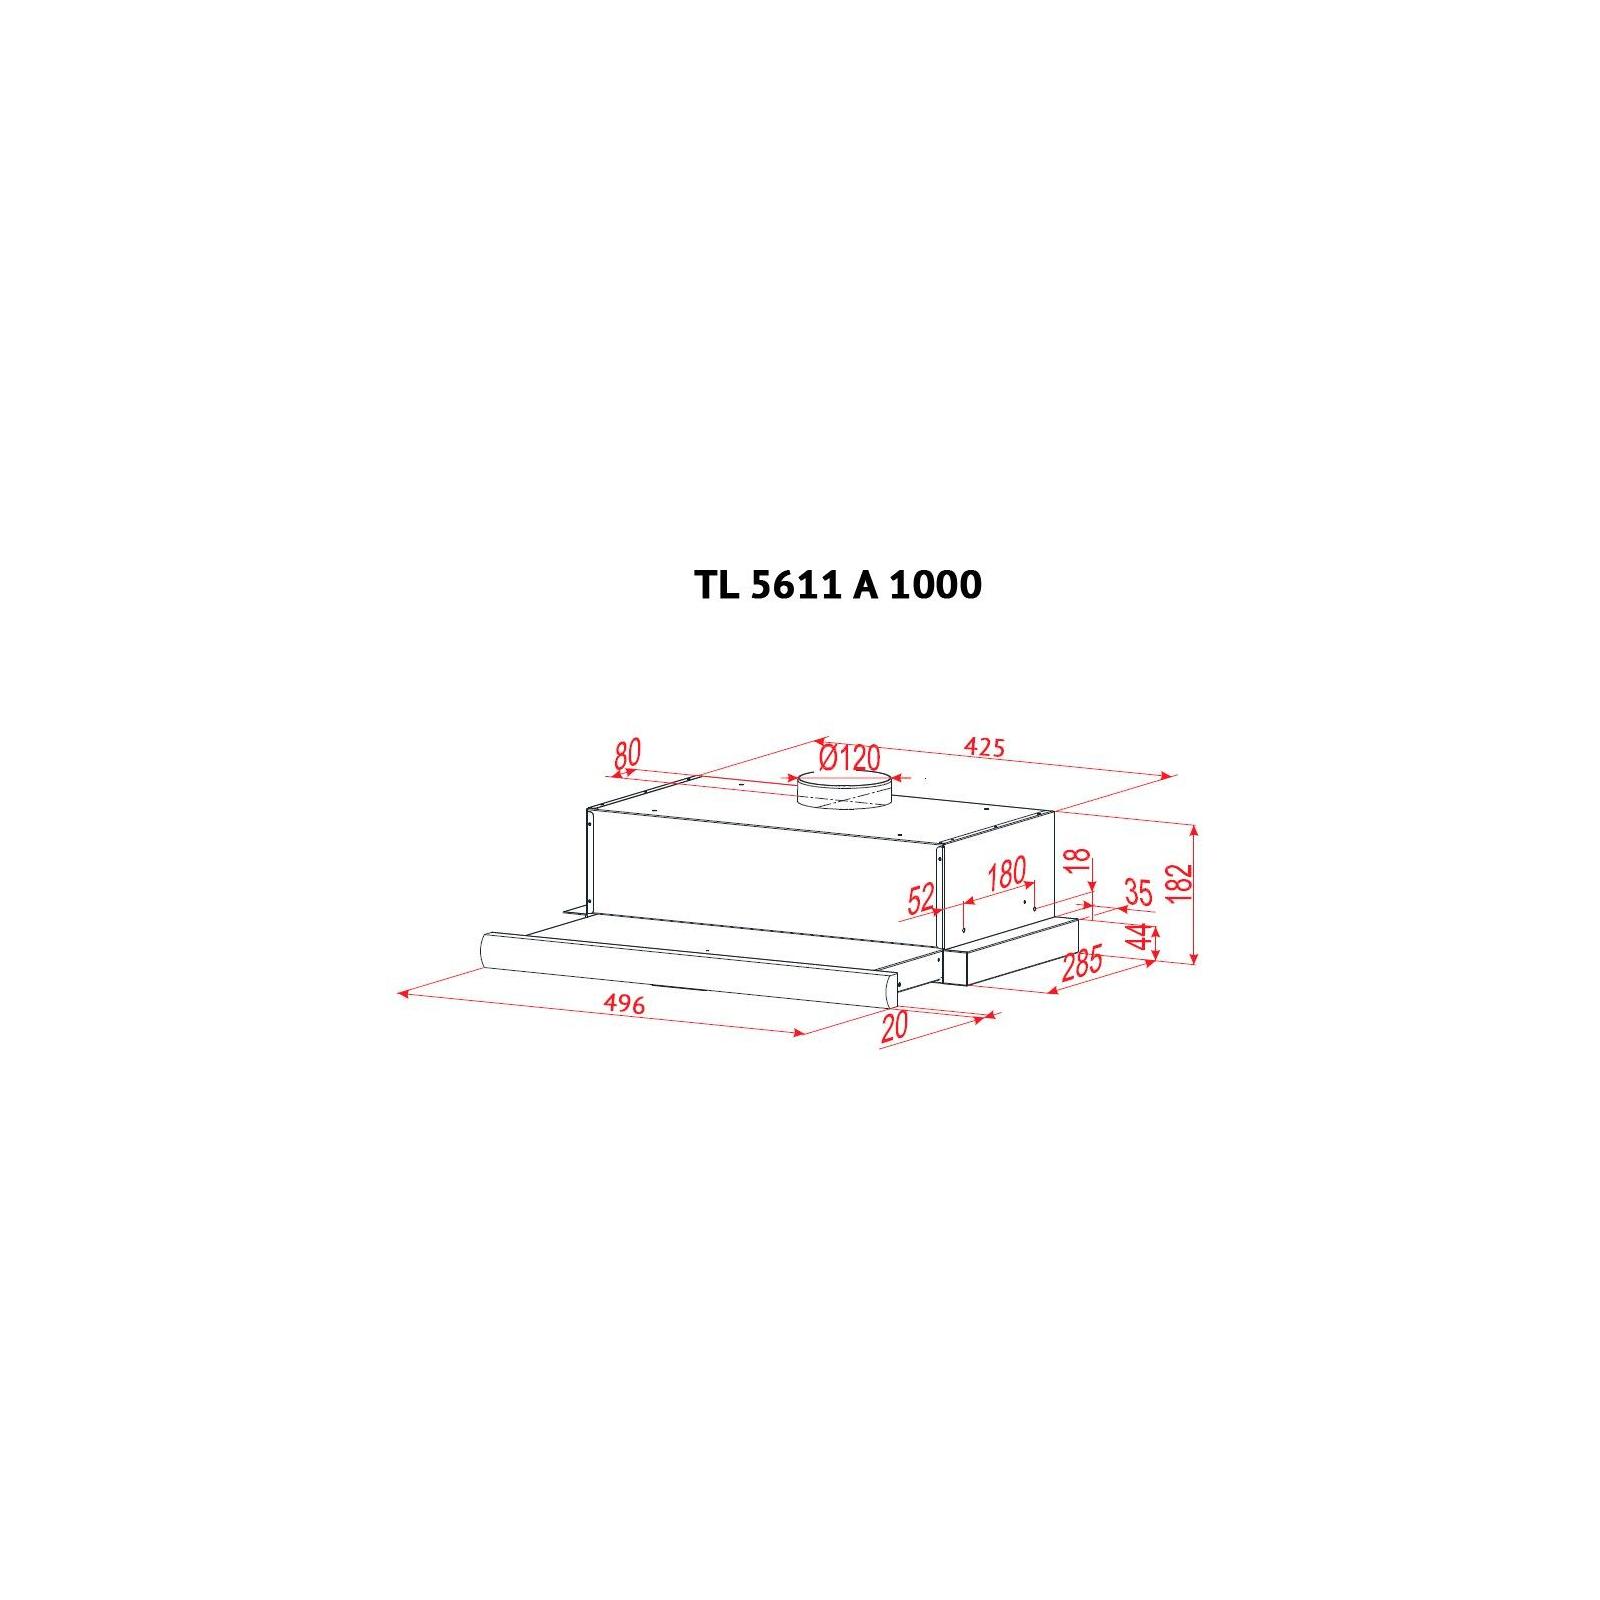 Вытяжка кухонная PERFELLI TL 5611 A 1000 W изображение 8